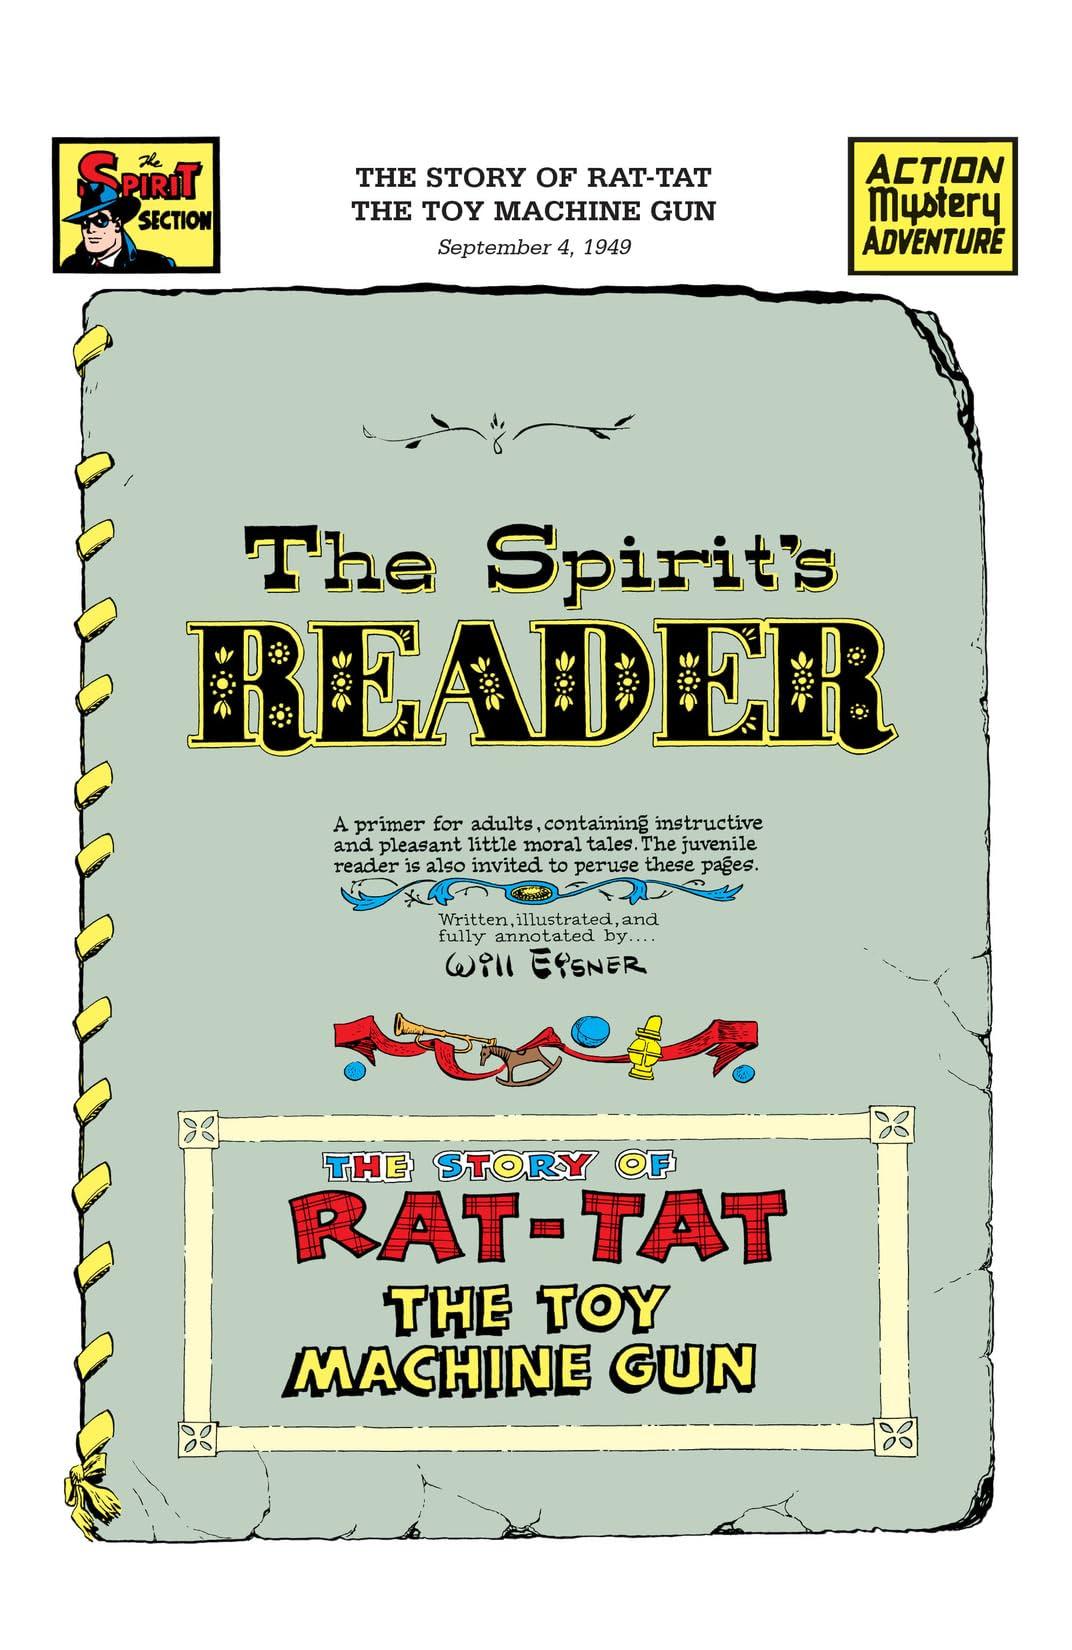 The Spirit #484: Rat-Tat, the Toy Machine Gun